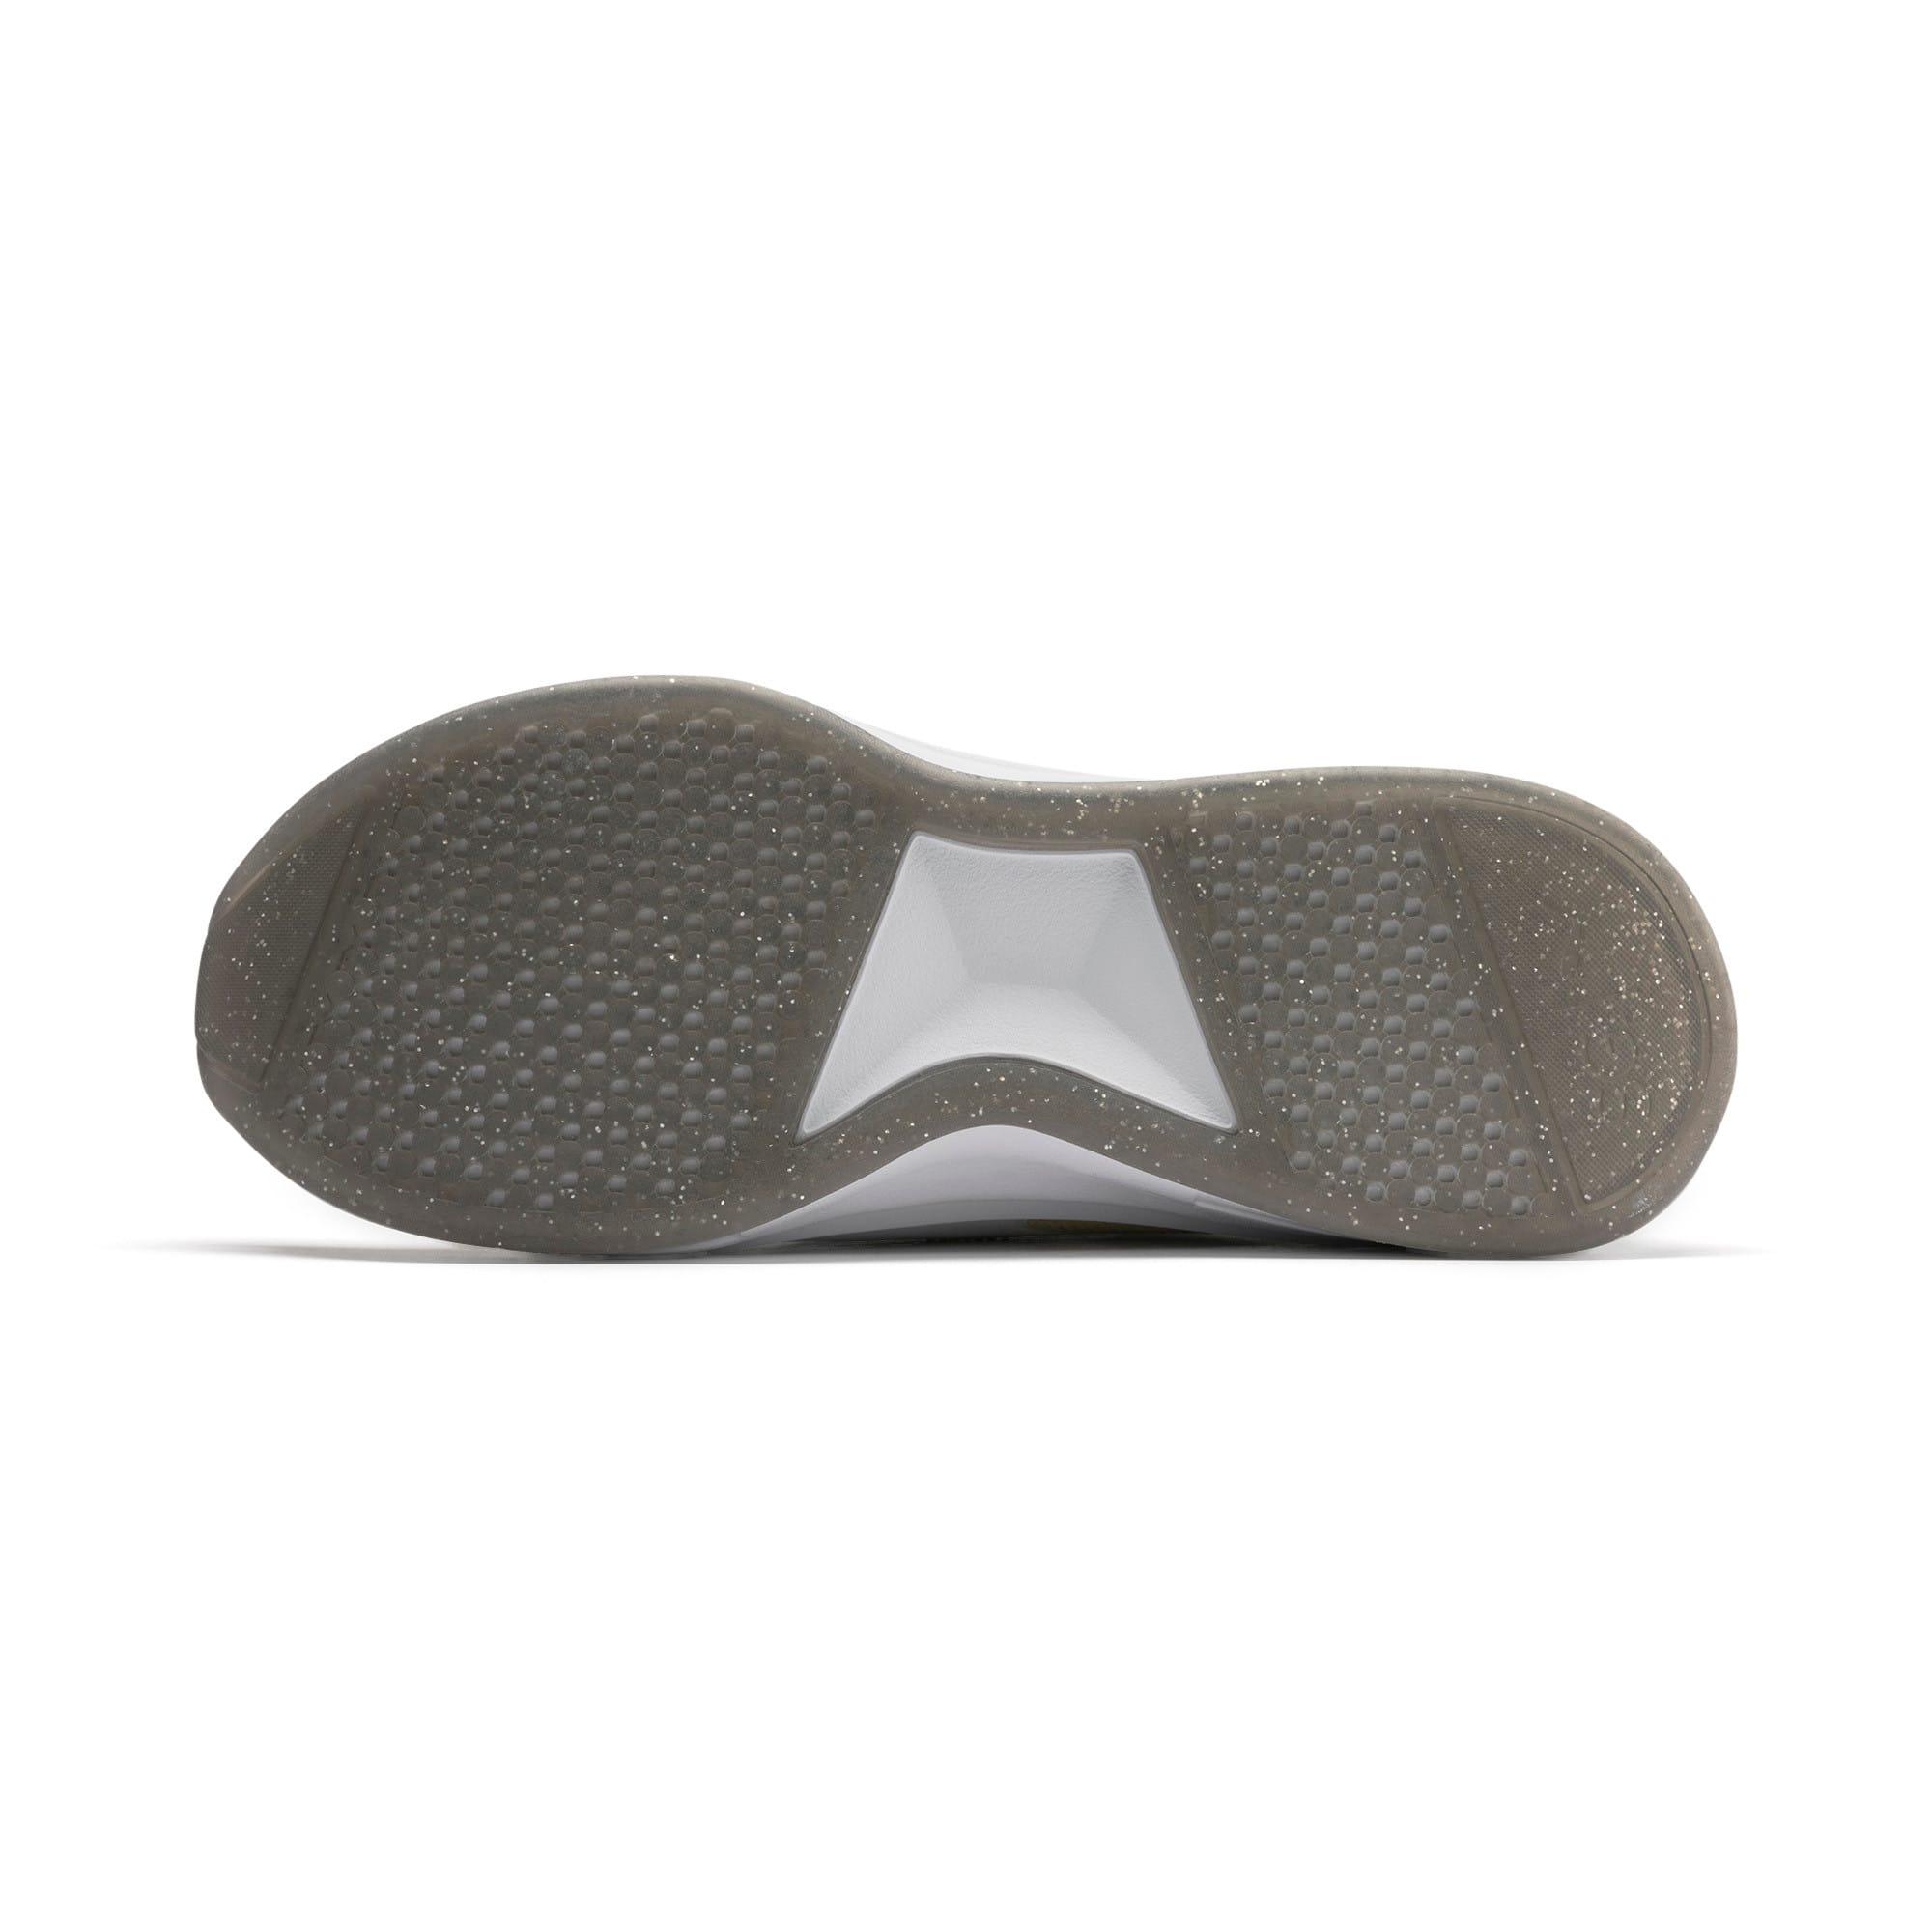 Thumbnail 5 of PUMA x SELENA GOMEZ Slip-On Gradient Women's Training Shoes, YELLOW-Peach Bud-White, medium